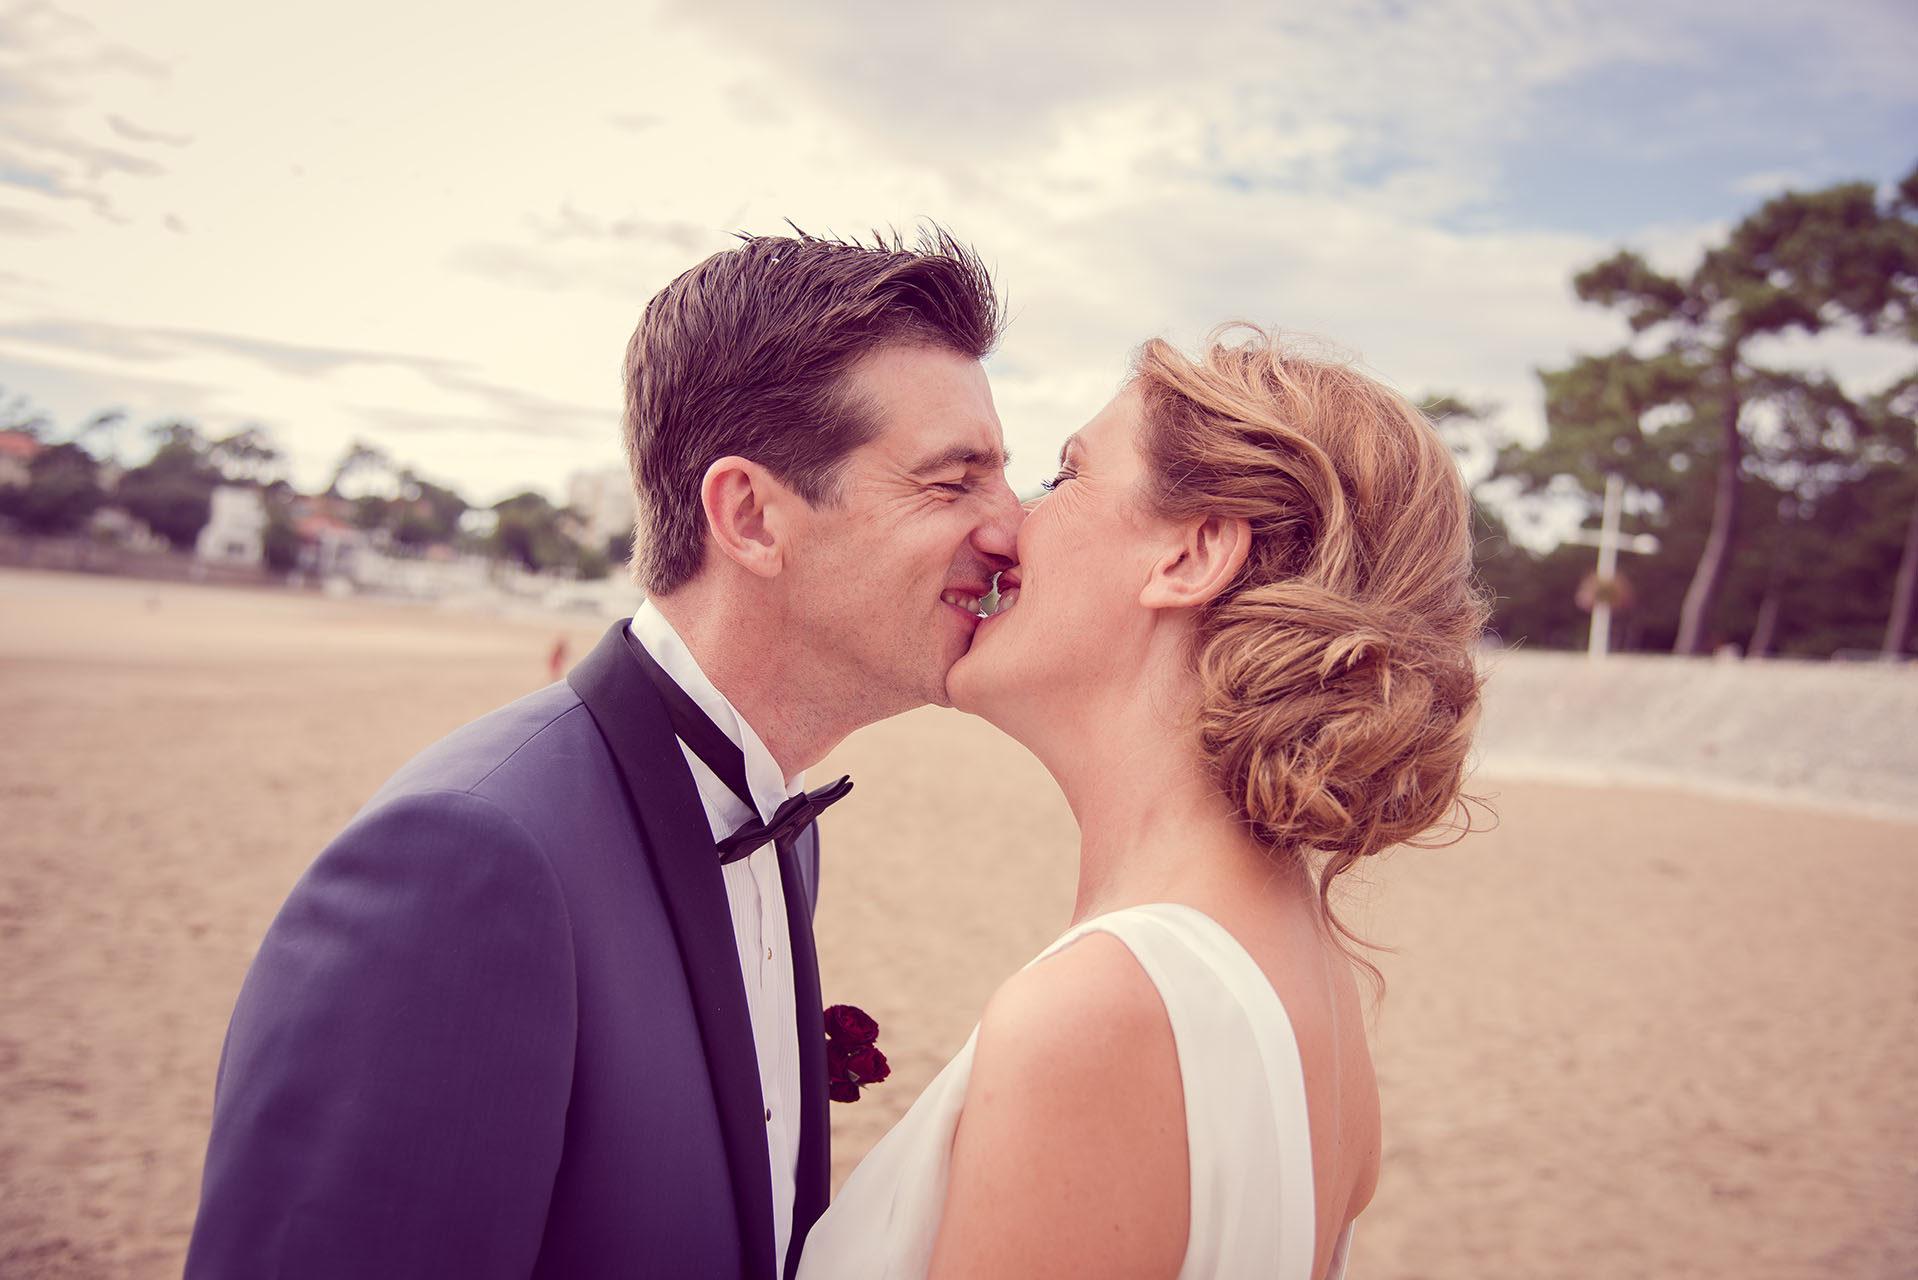 photographe-ile-de-france-mariage-yasmine-philippe-val-de-marne